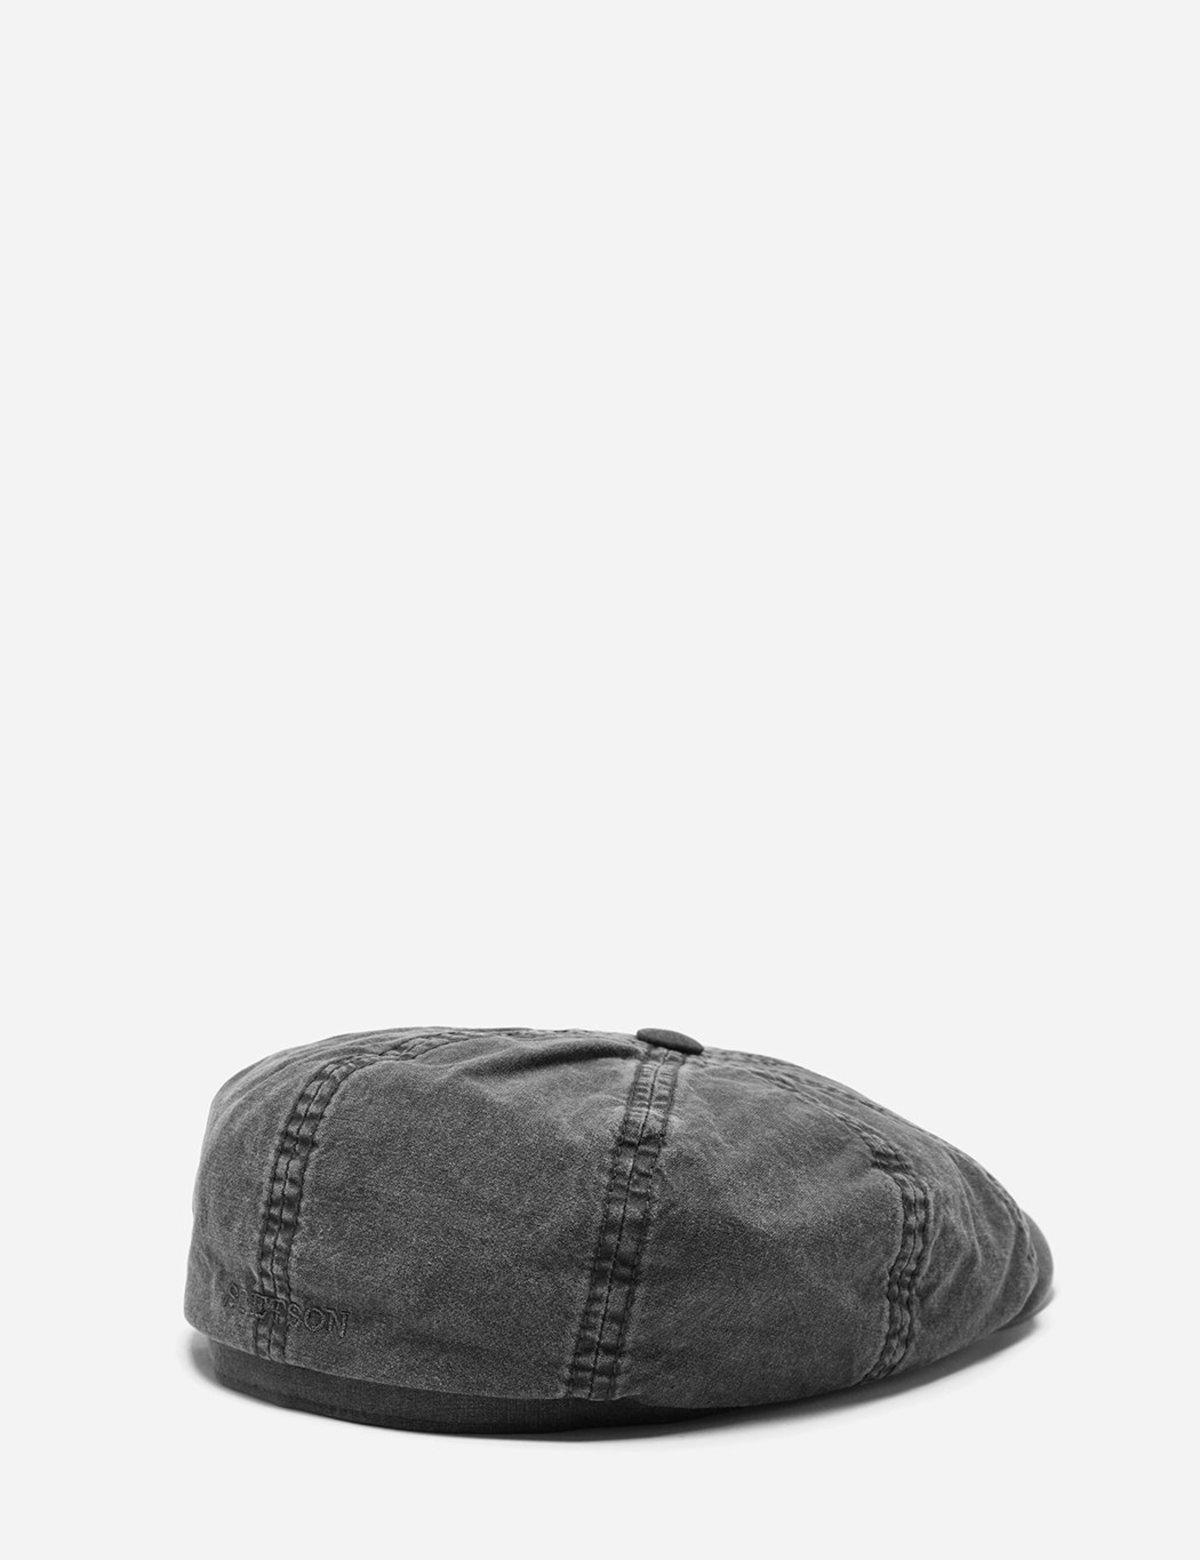 7ebce1d3 Stetson Hats Stetson Hatteras Delave Organic Cotton Newsboy Cap ...